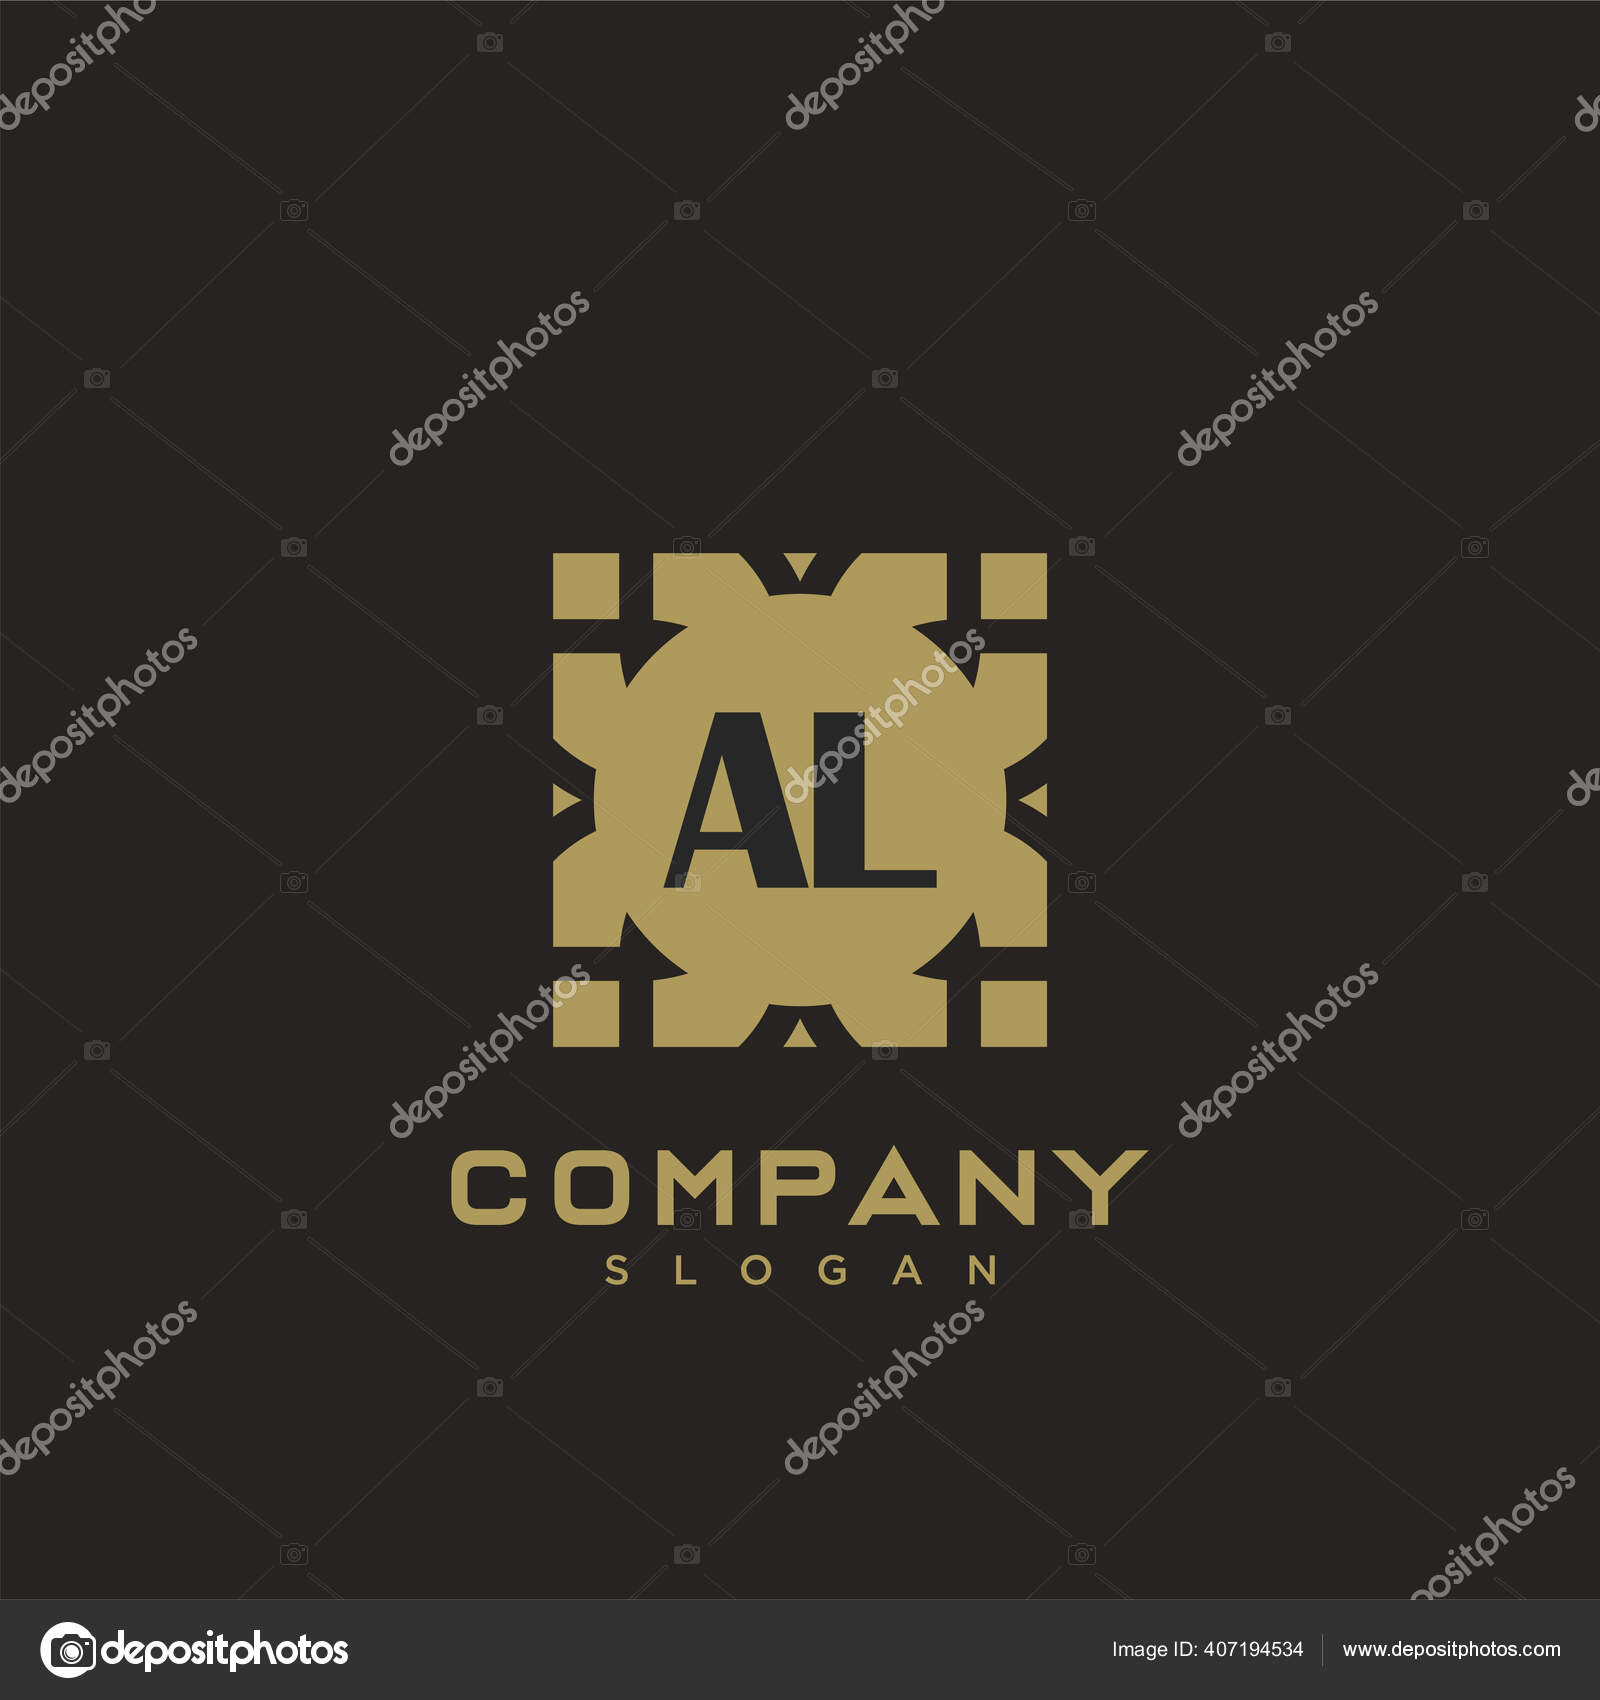 Logo Inisial Huruf Monogram Premium Desain Vektor Simbol Minimalis Templat Stok Vektor C Duwekbro87 Gmail Com 407194534